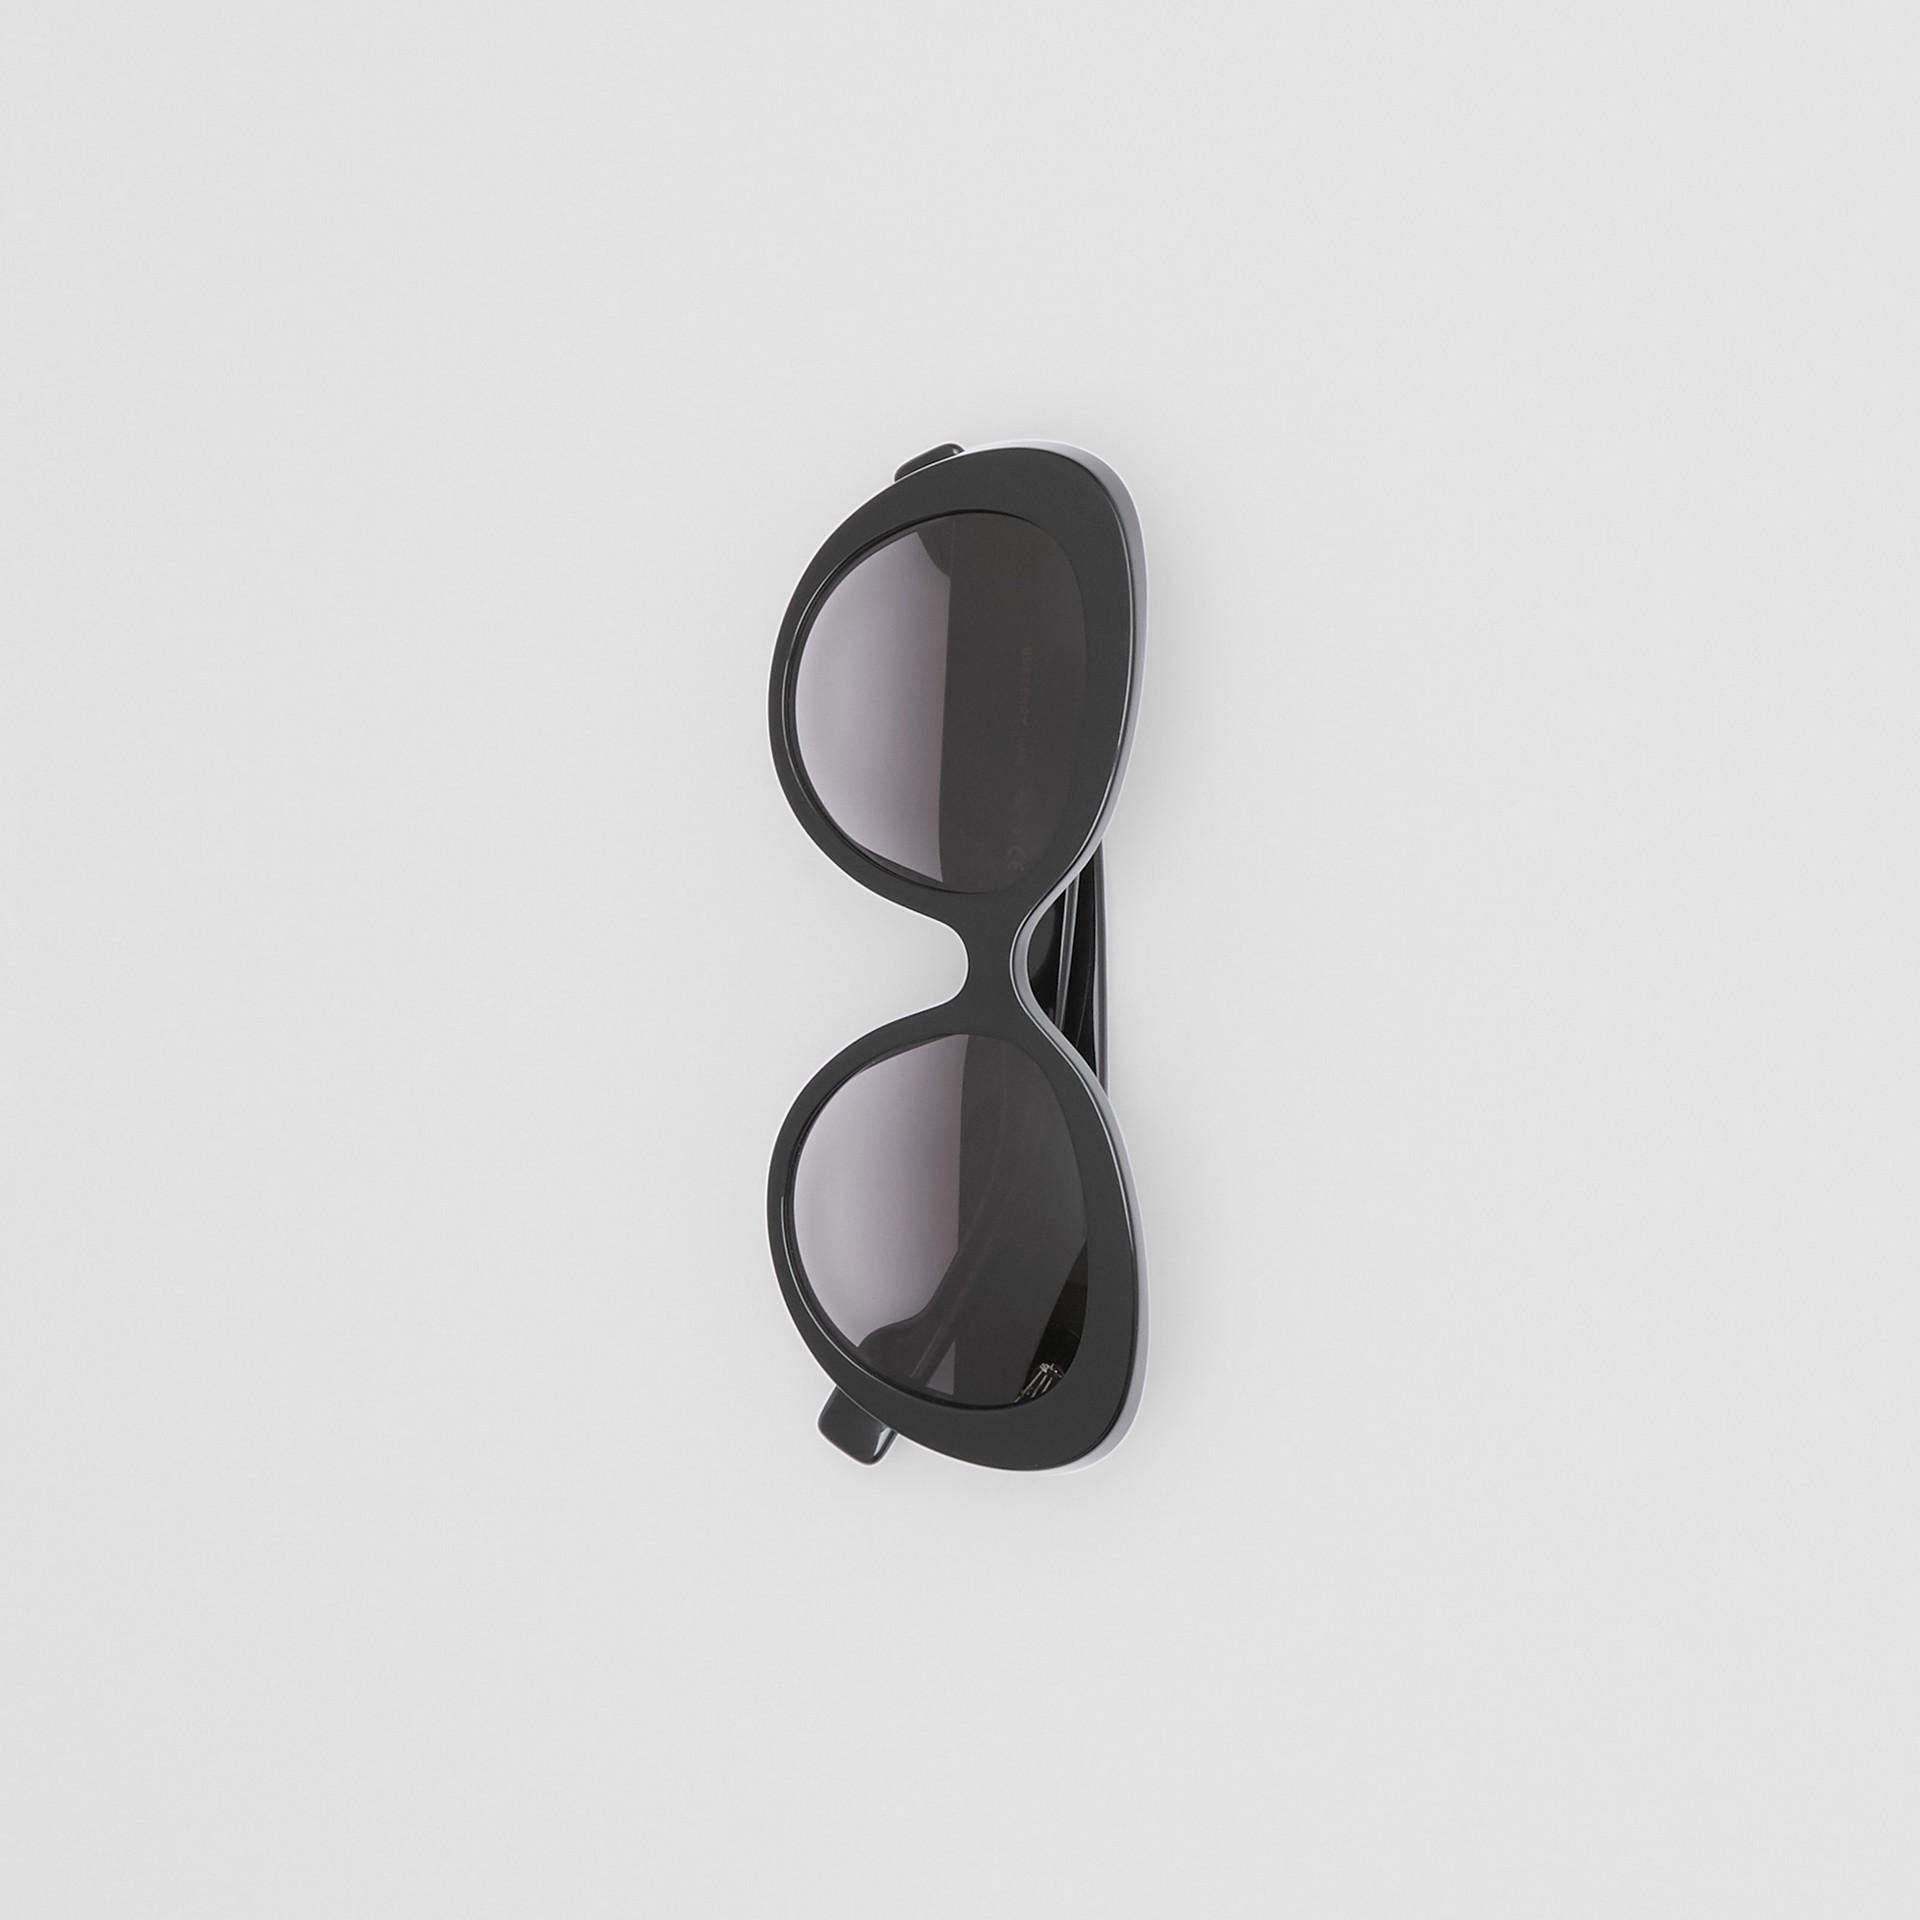 Monogram Motif Cat-eye Frame Sunglasses in Black - Women | Burberry United Kingdom - gallery image 3